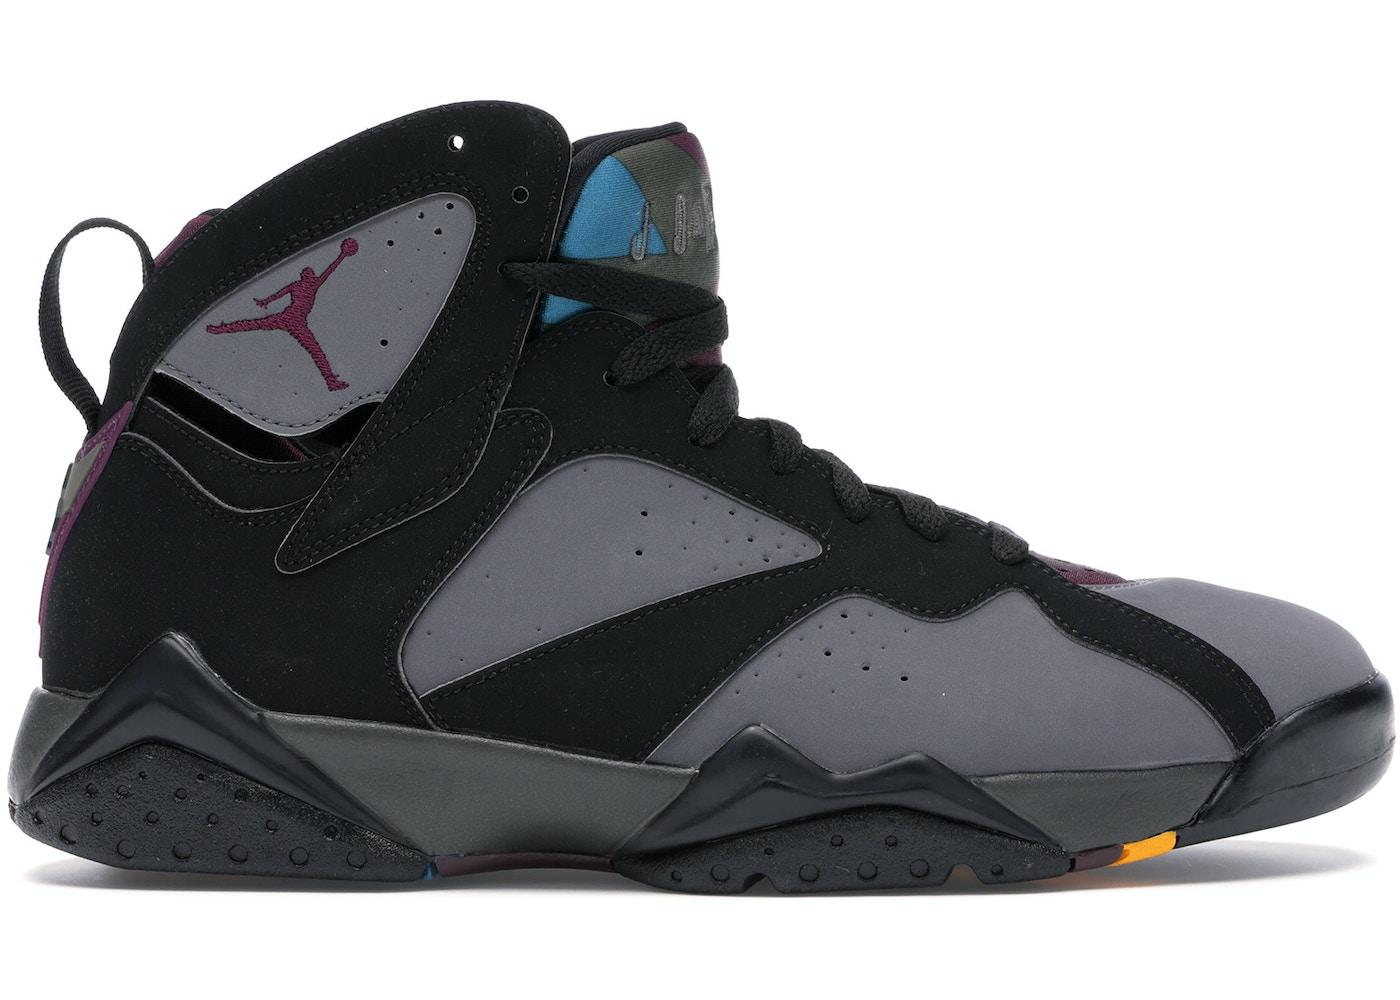 11b509dad6d373 Jordan 7 Retro Bordeaux 2015 (GS) - 304774-034